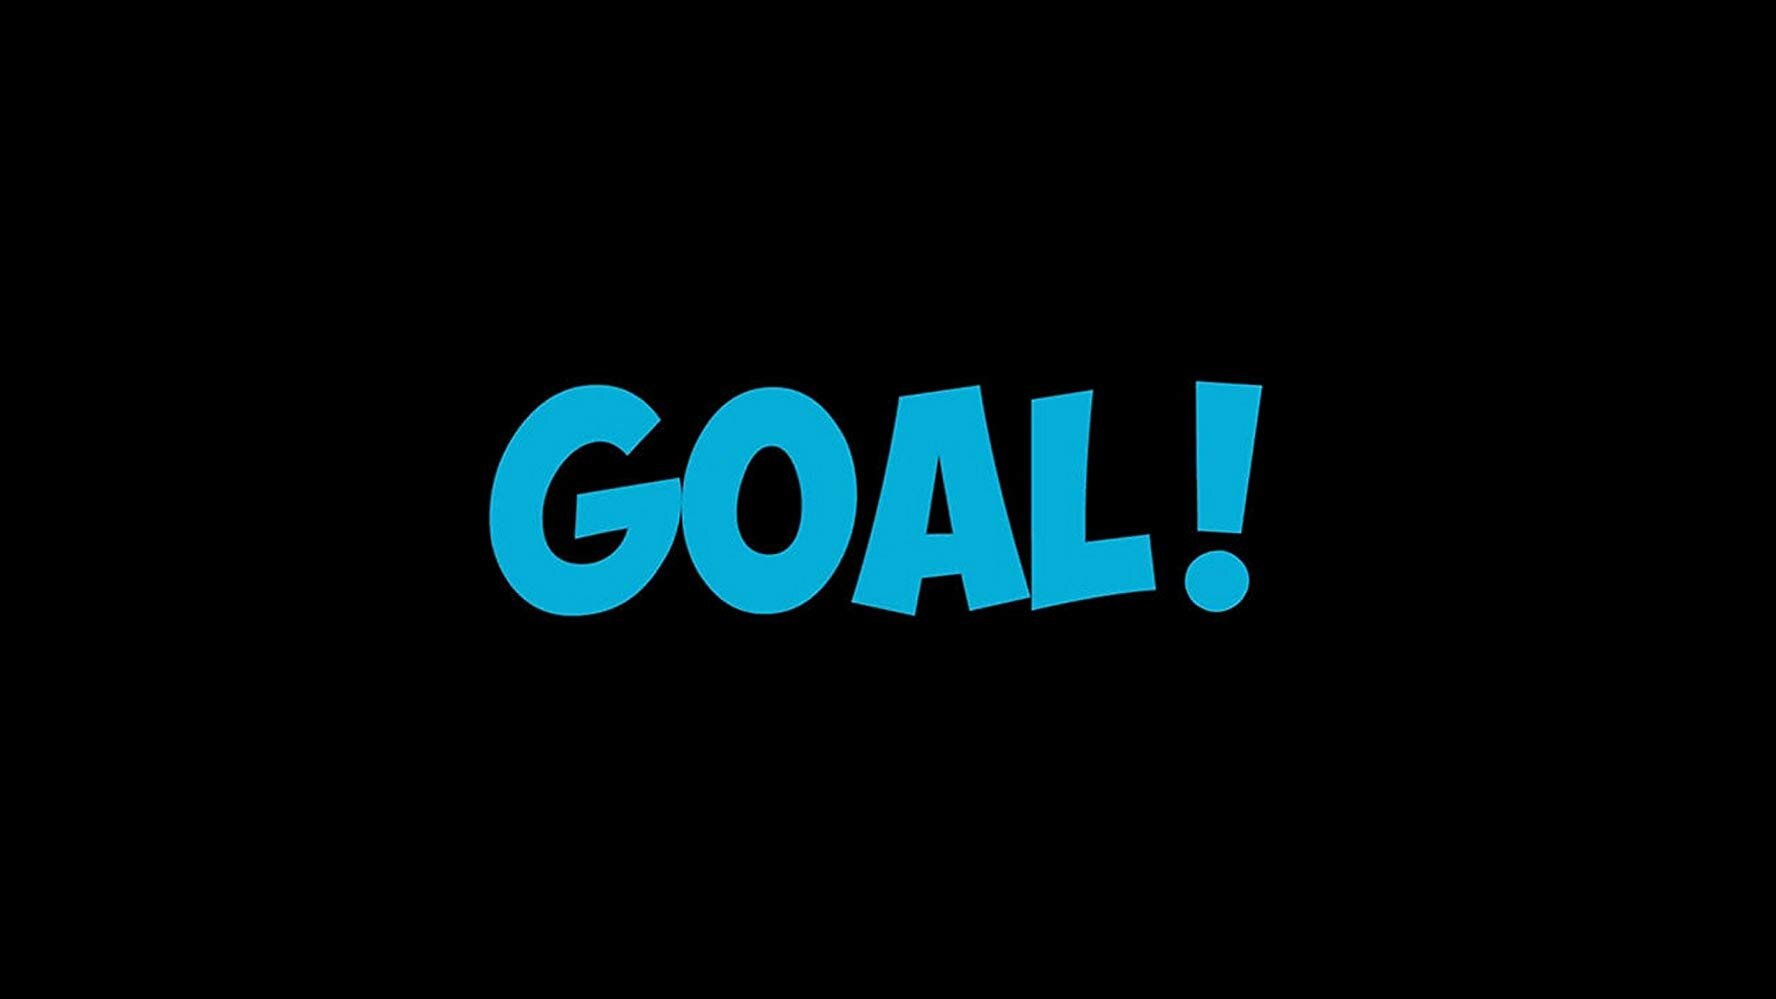 Goal: Short Film - Directed by Colin CunninghamDaryl Bennett: Composer